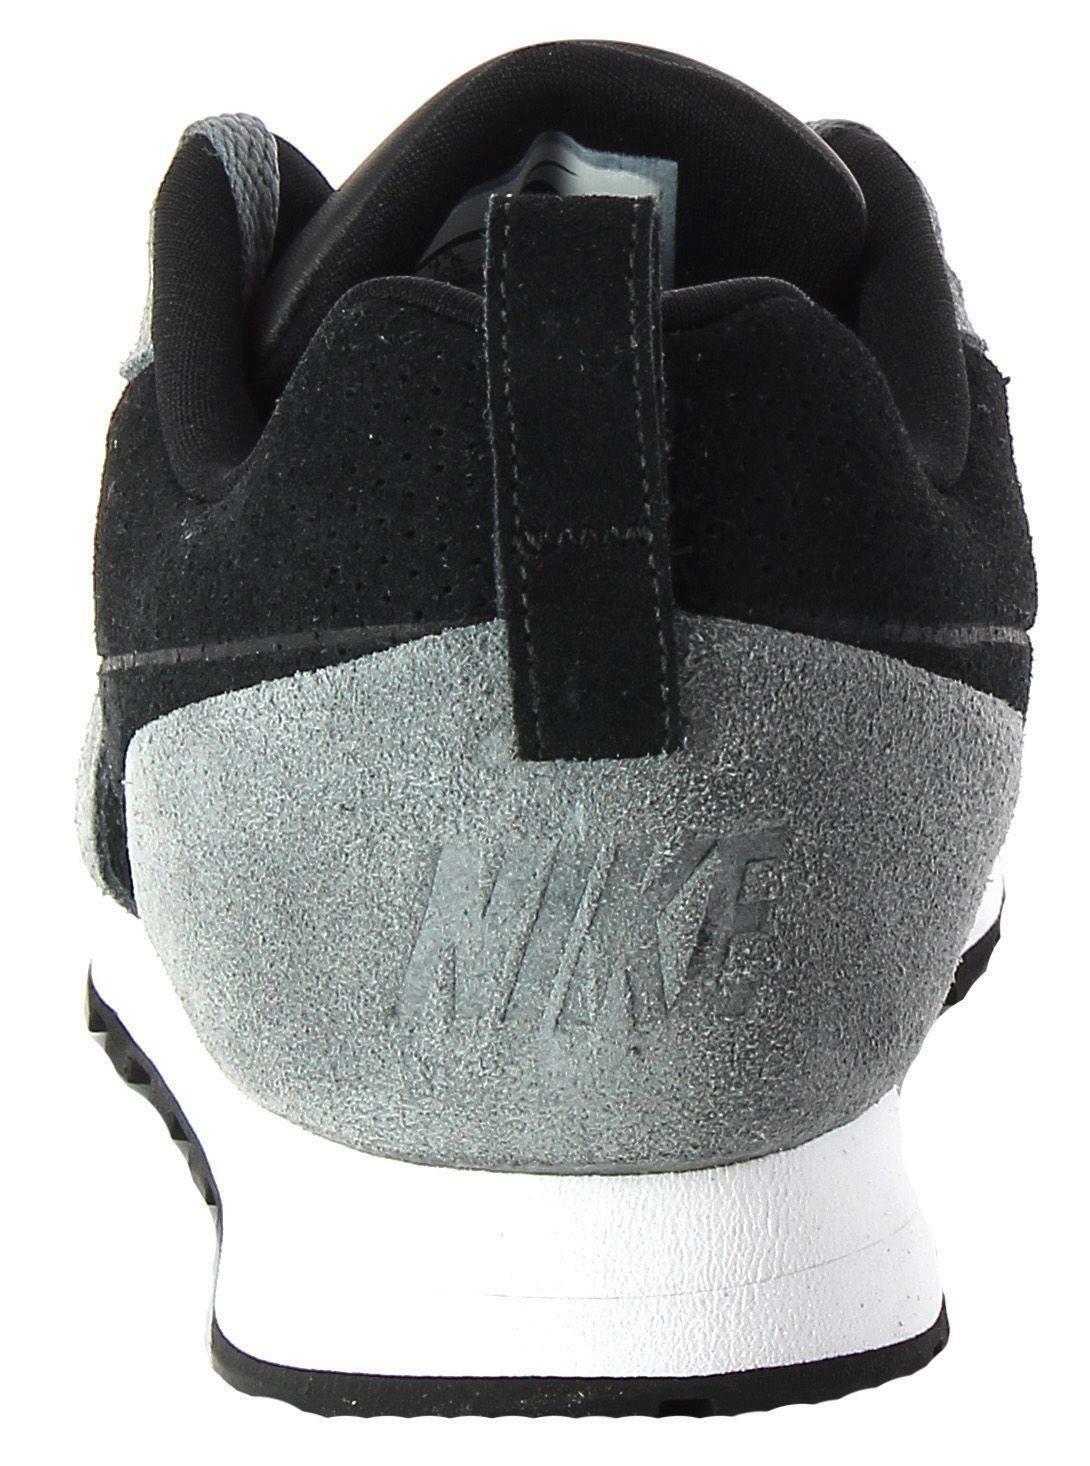 nike nike md runner 2 leather prem scarpe sportive uomo grigie